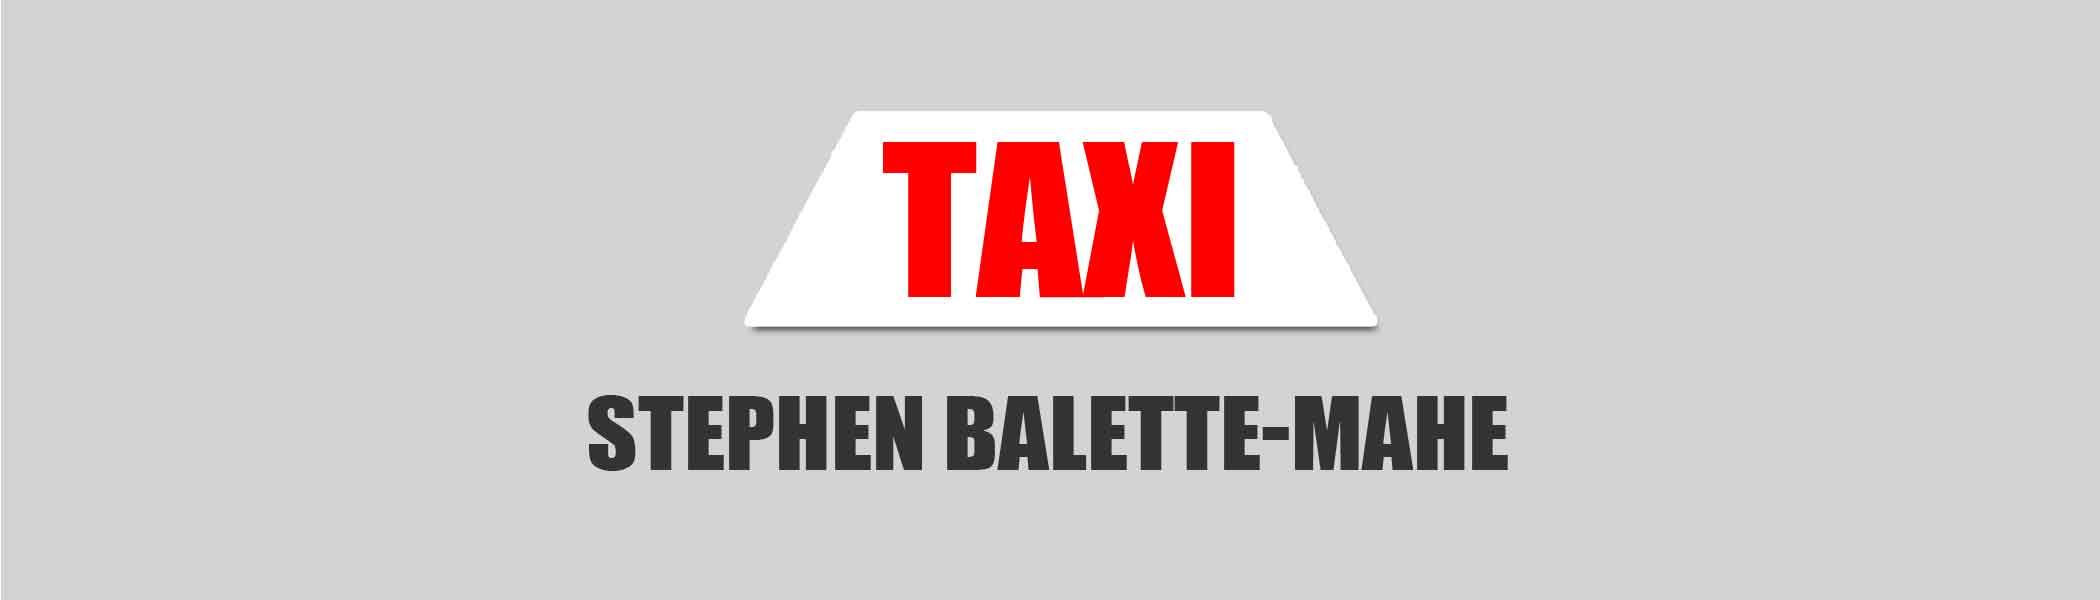 stephen-balette, Taxis in Seychelles Islands